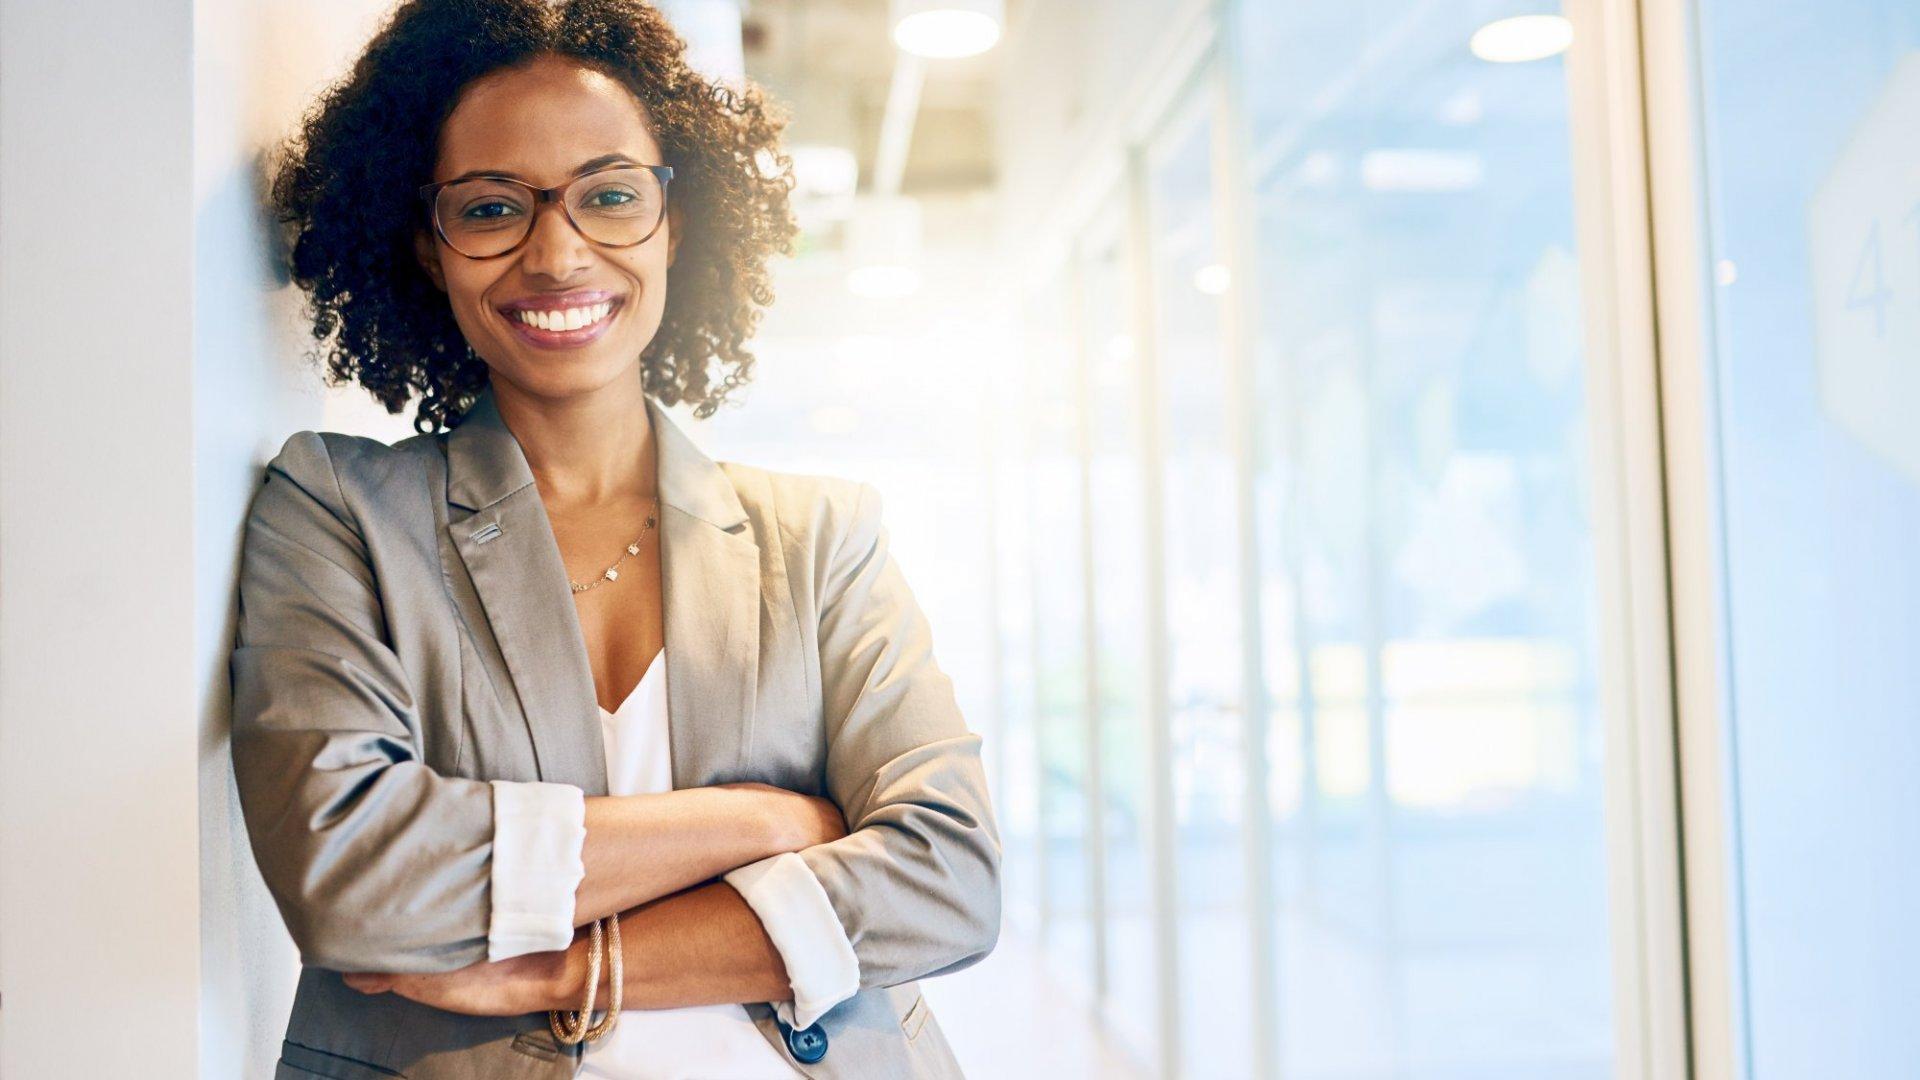 7 Ways to Shut Down Negative Self-Talk and Regain Confidence